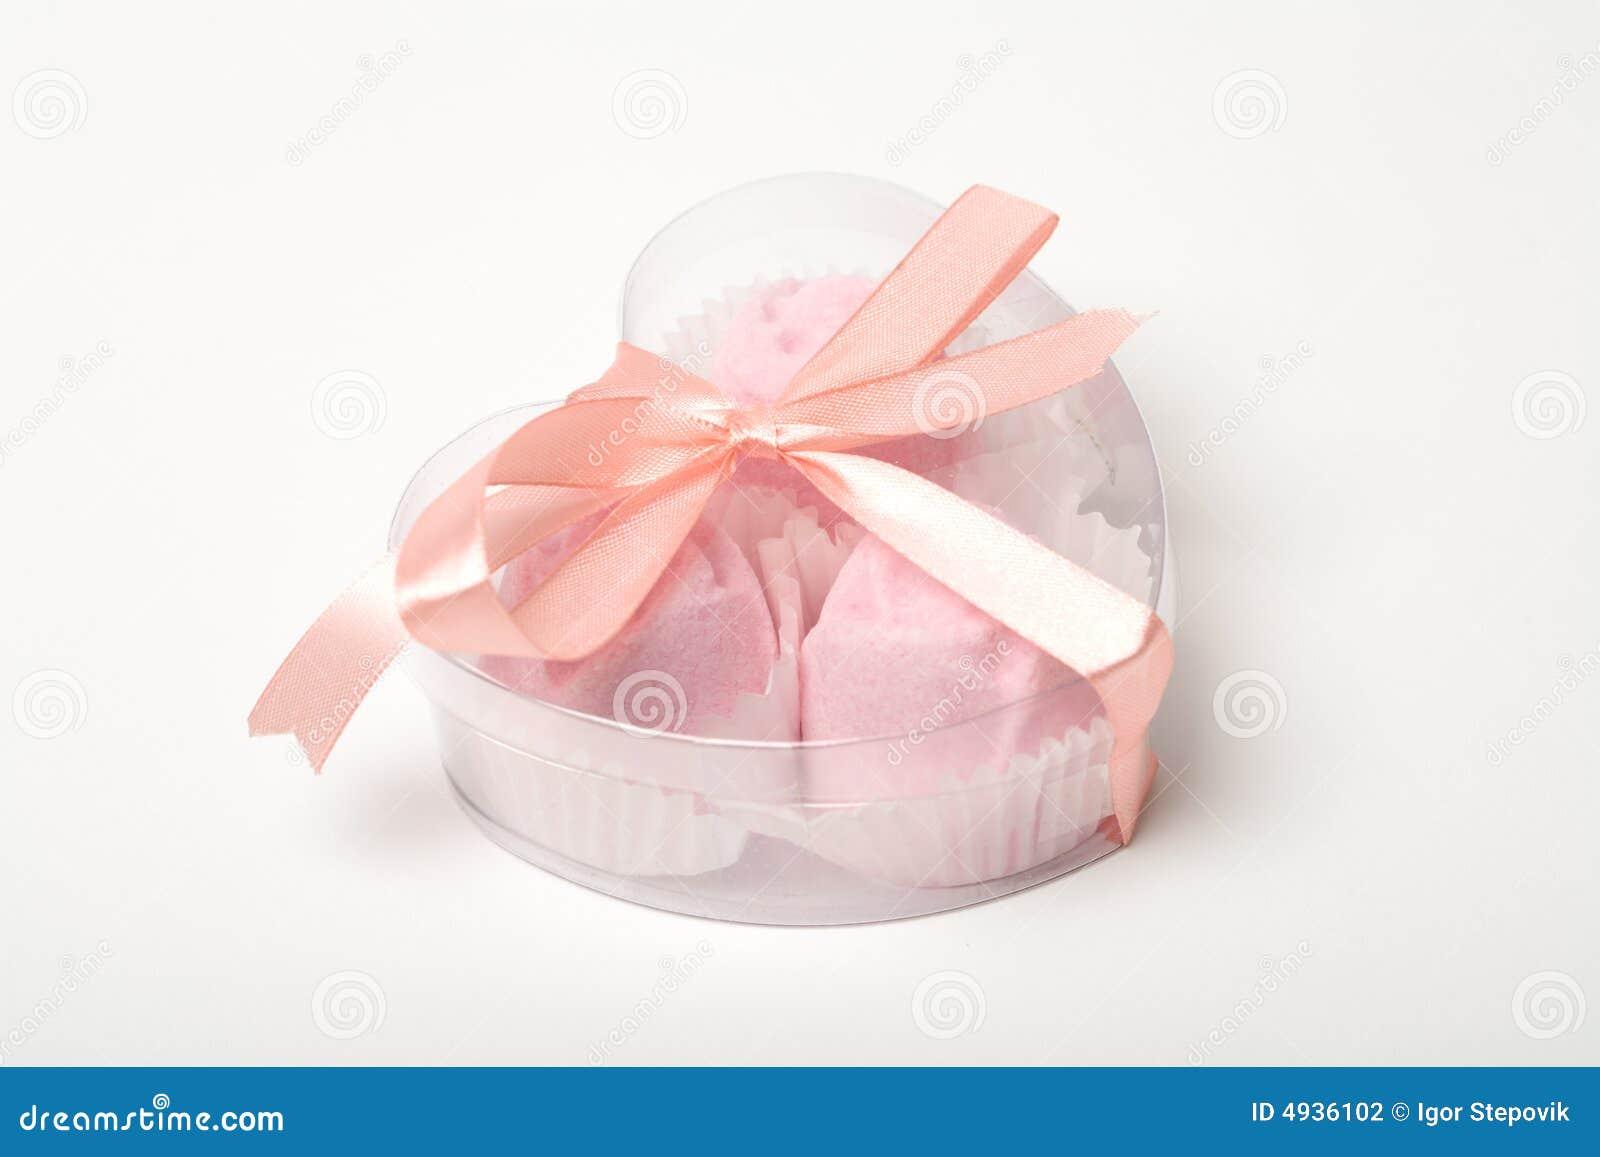 Asken bakar ihop hjärta little över pinken formad white